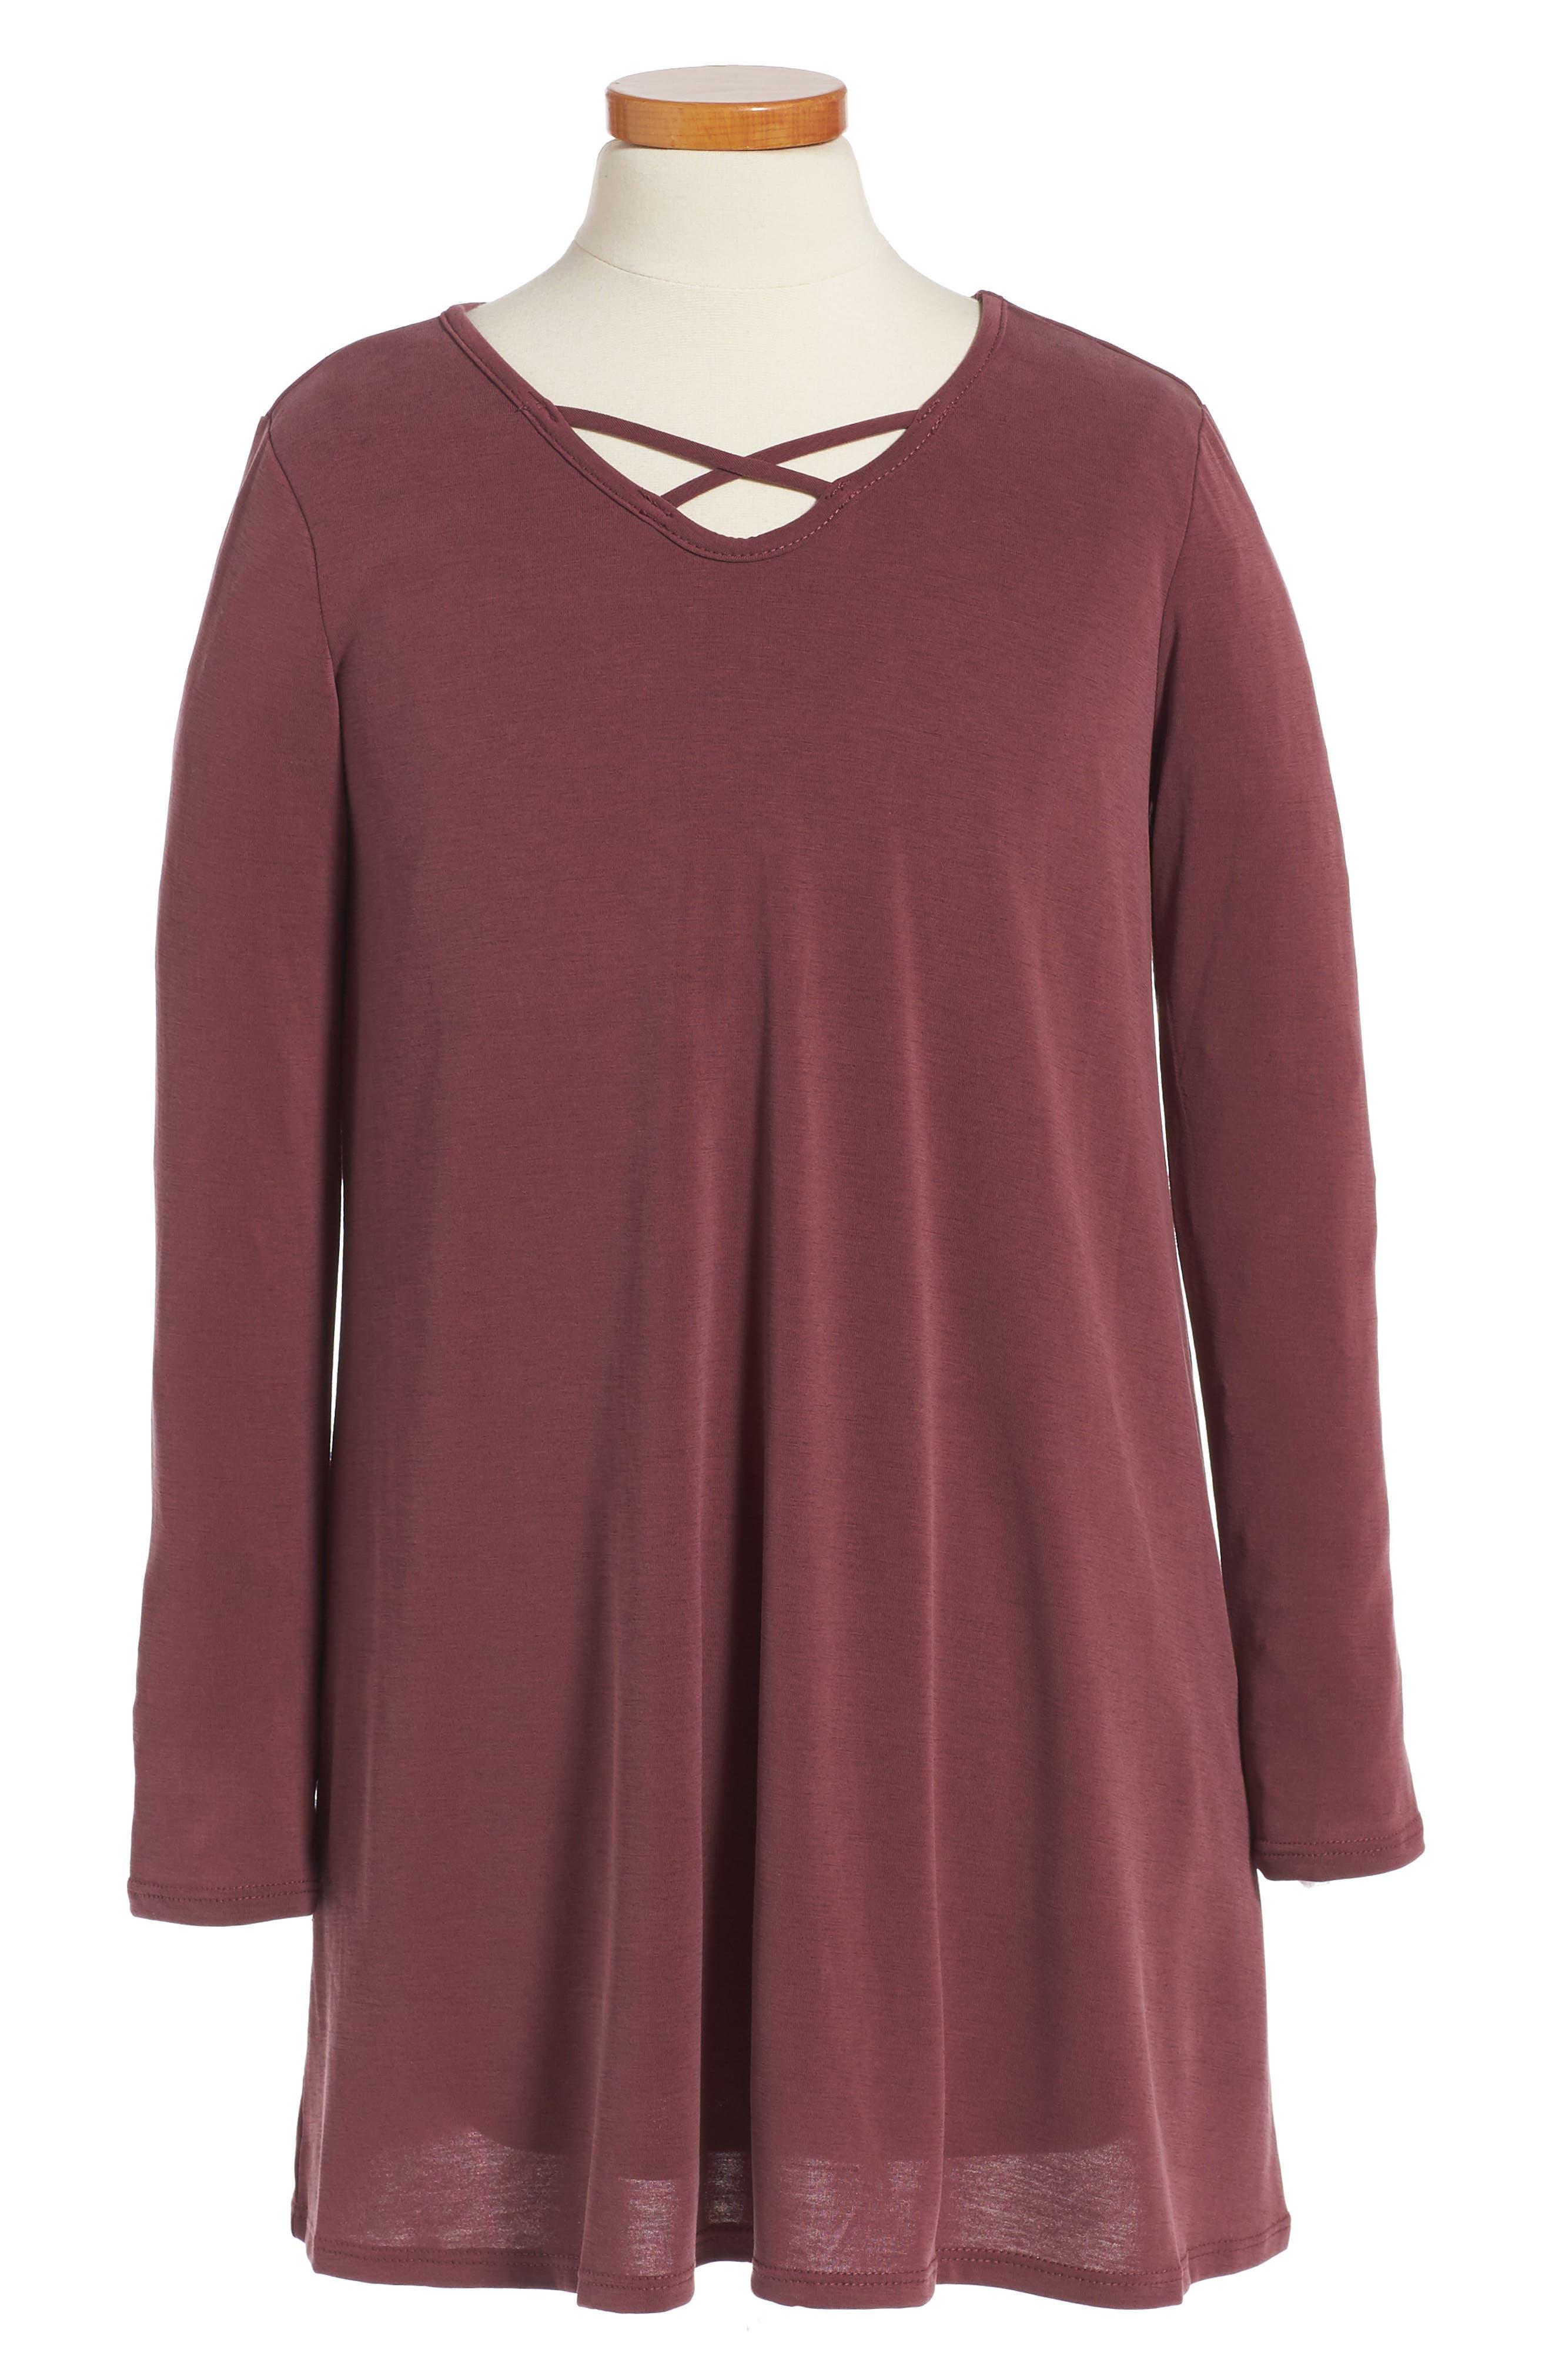 For All Seasons Cross Front Knit Dress (Big Girls)